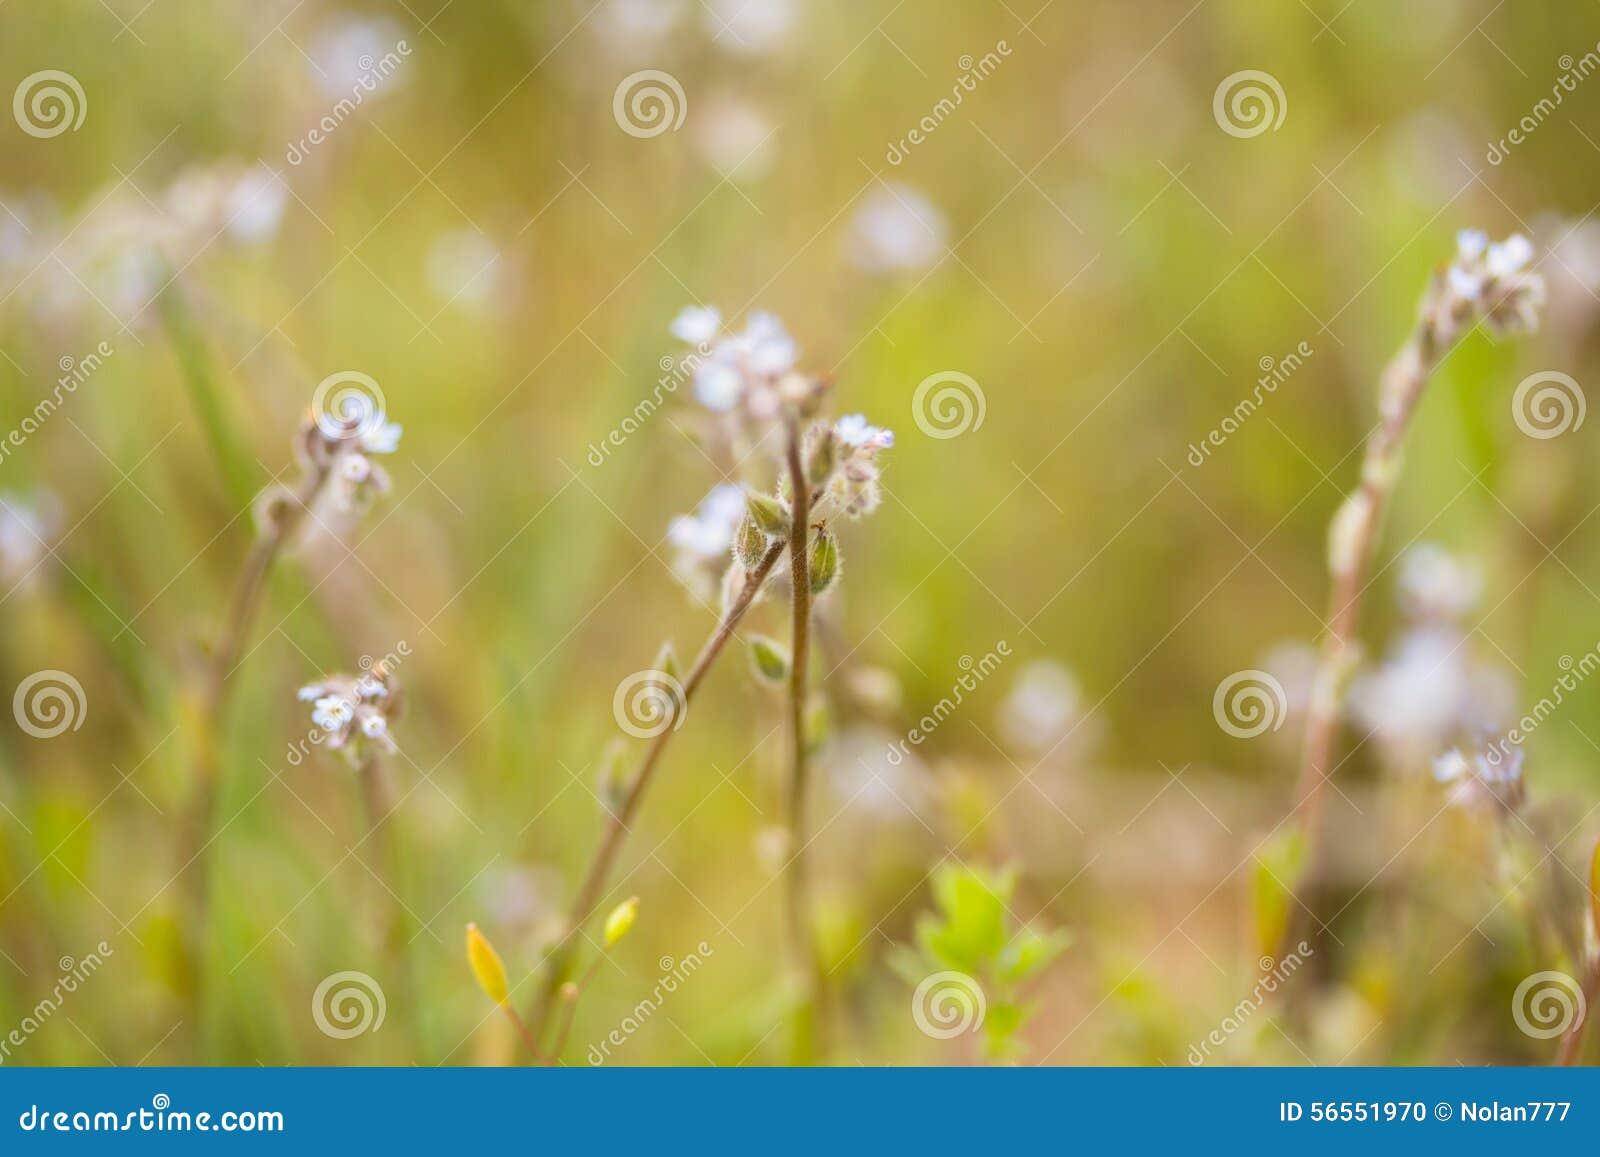 Download Μπλε λουλούδια προς το λιβάδι Στοκ Εικόνες - εικόνα από floral, αρκετά: 56551970